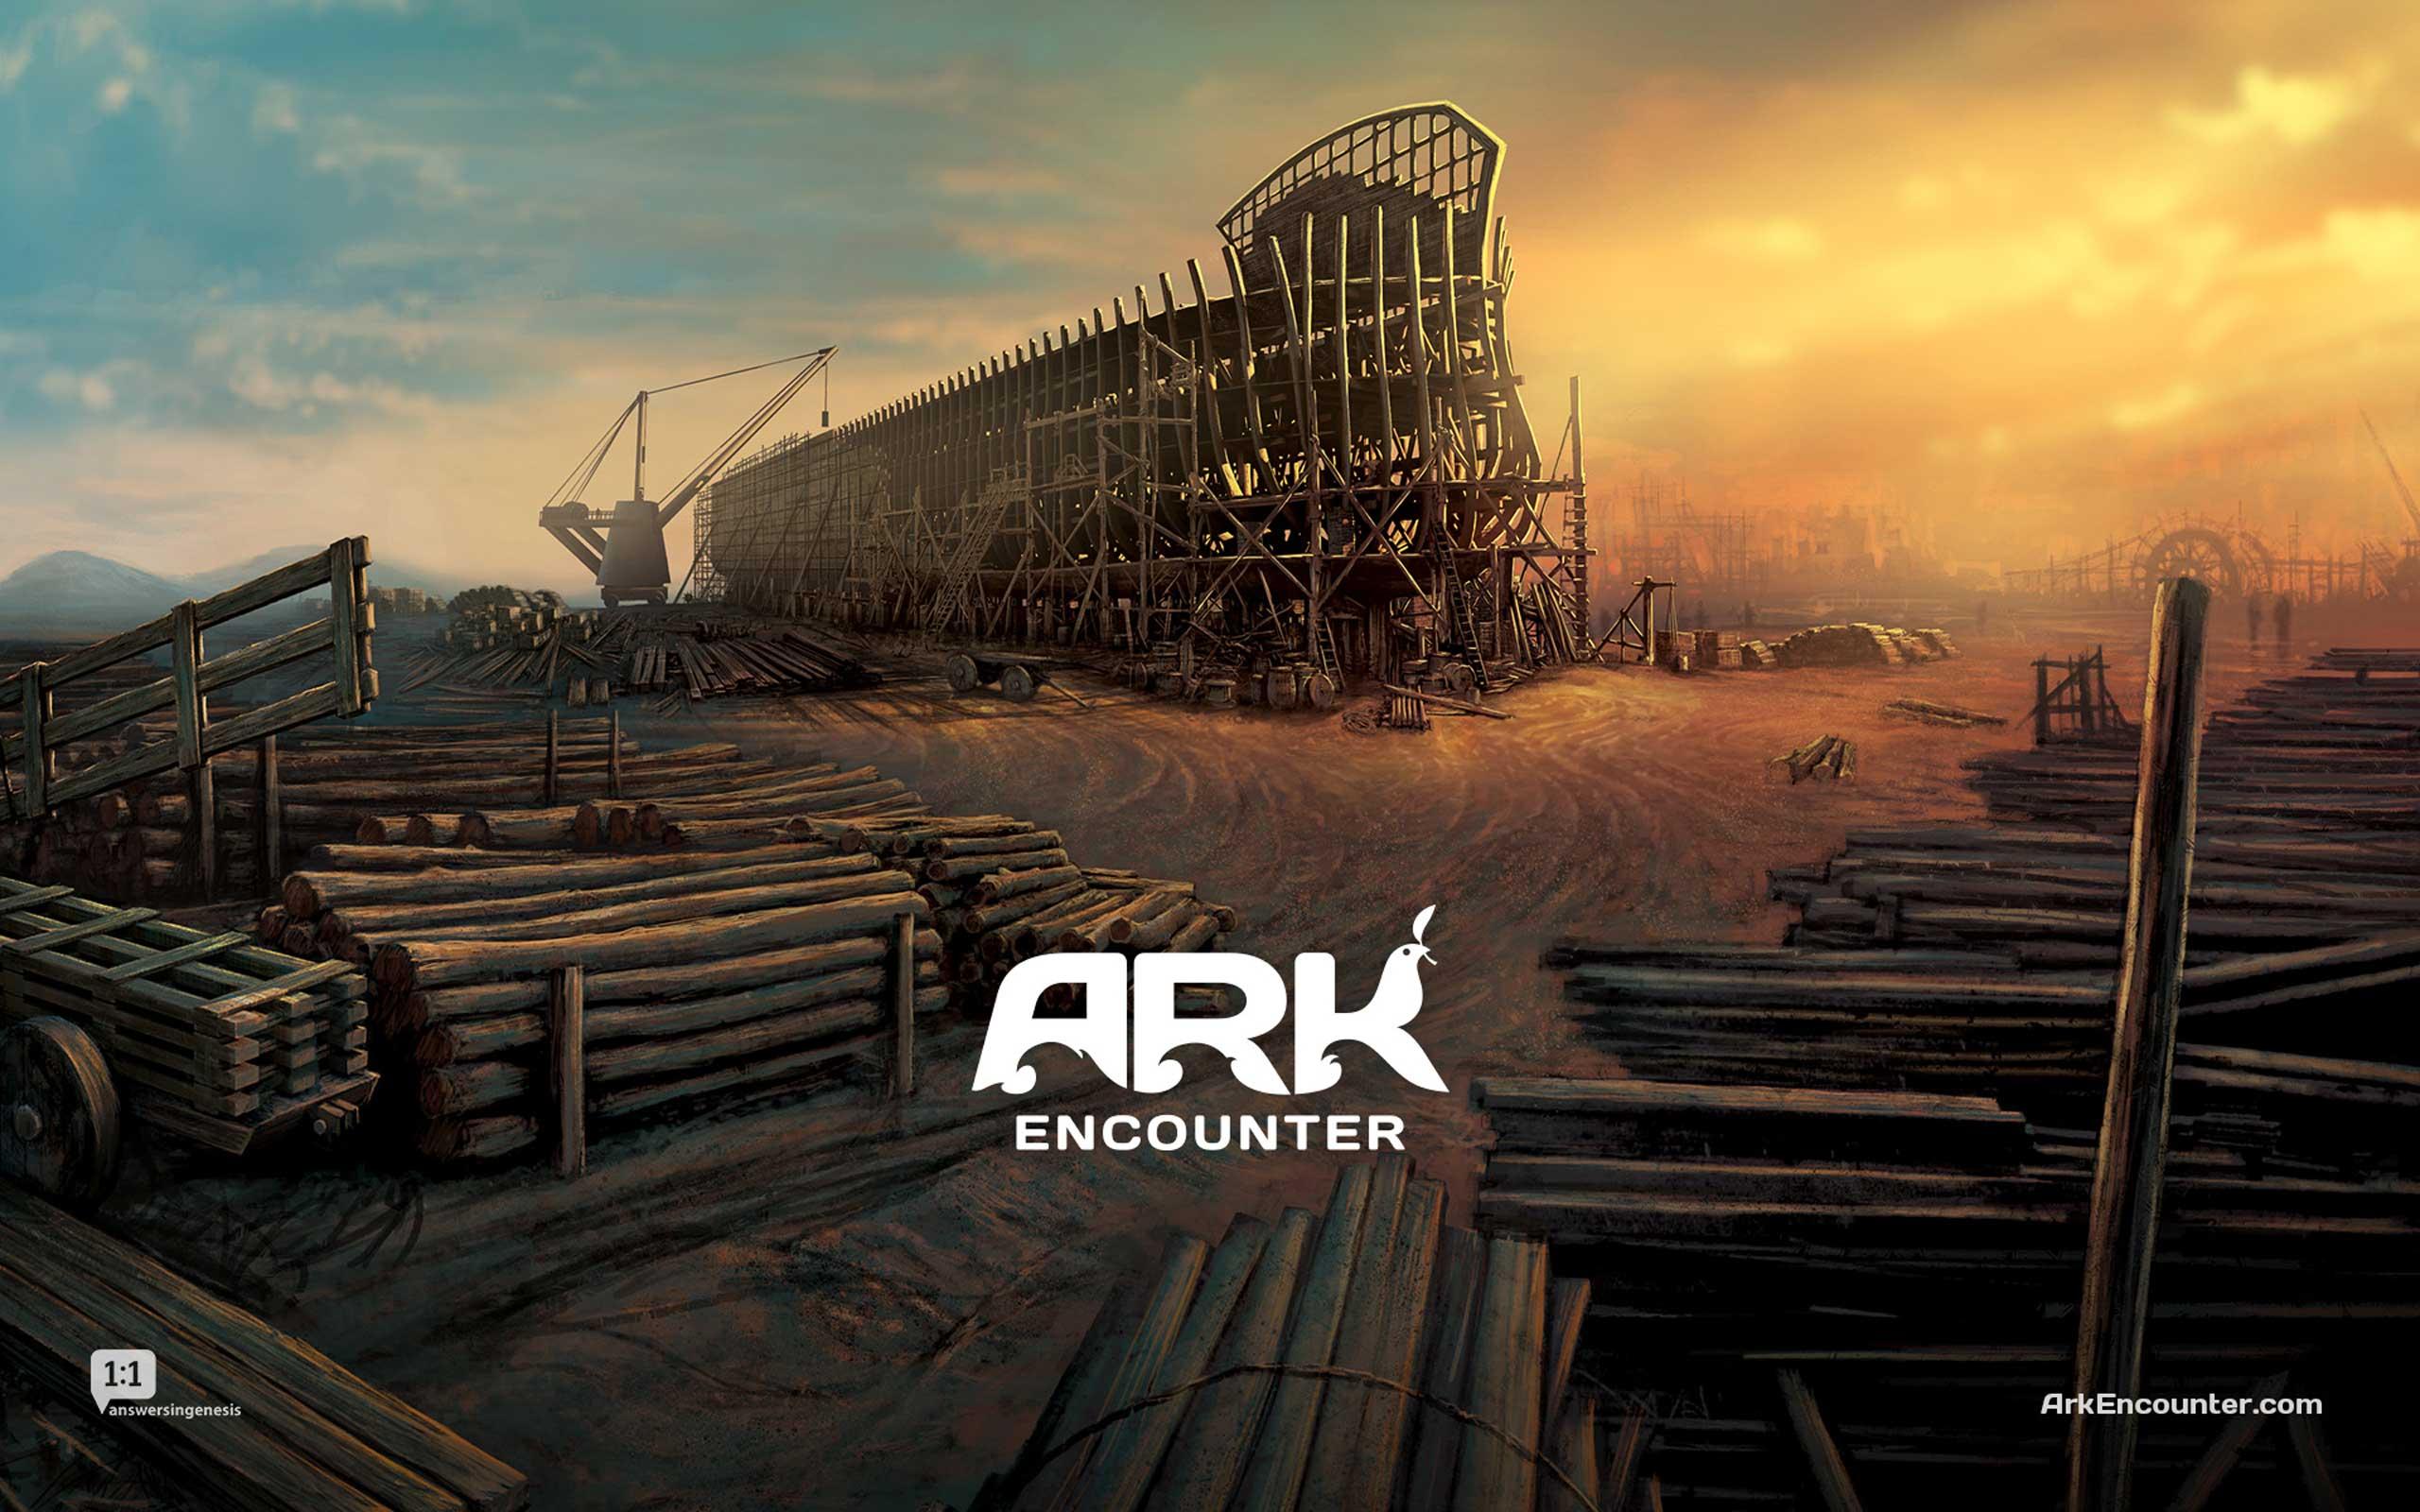 Concept art of Noah's Ark